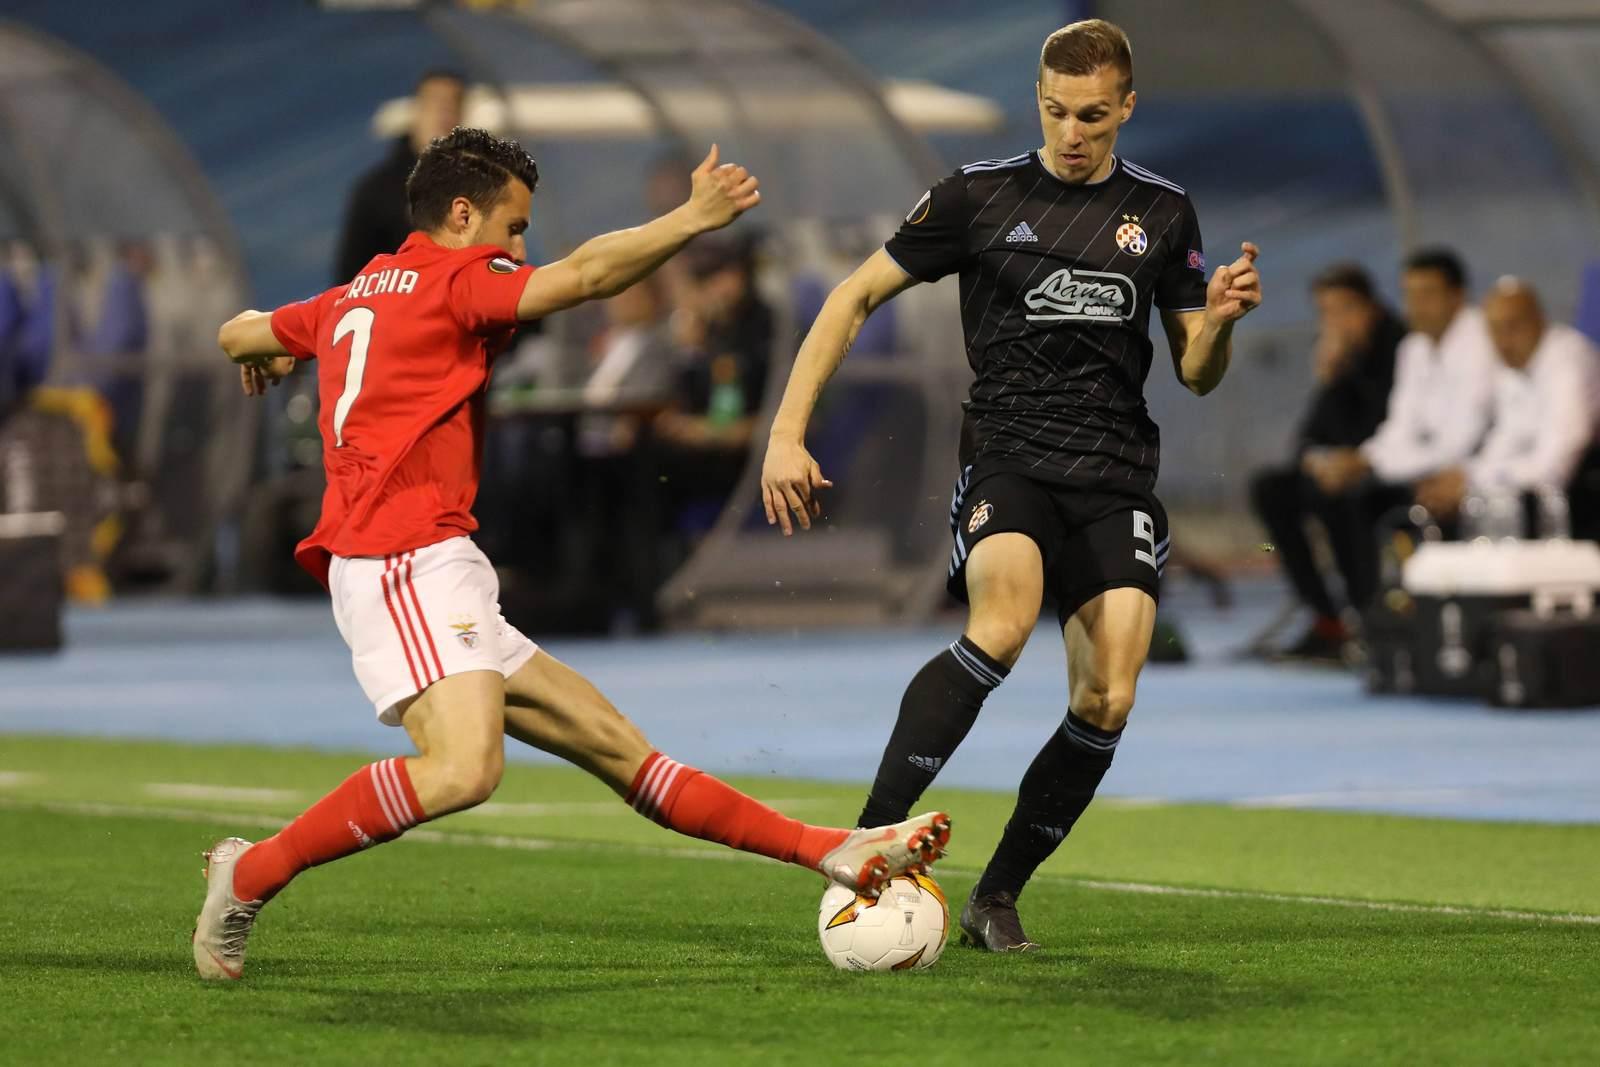 Sebastien Corchia gegen Mislav Orsic. Jetzt auf Benfica gegen Dinamo Zagreb wetten.